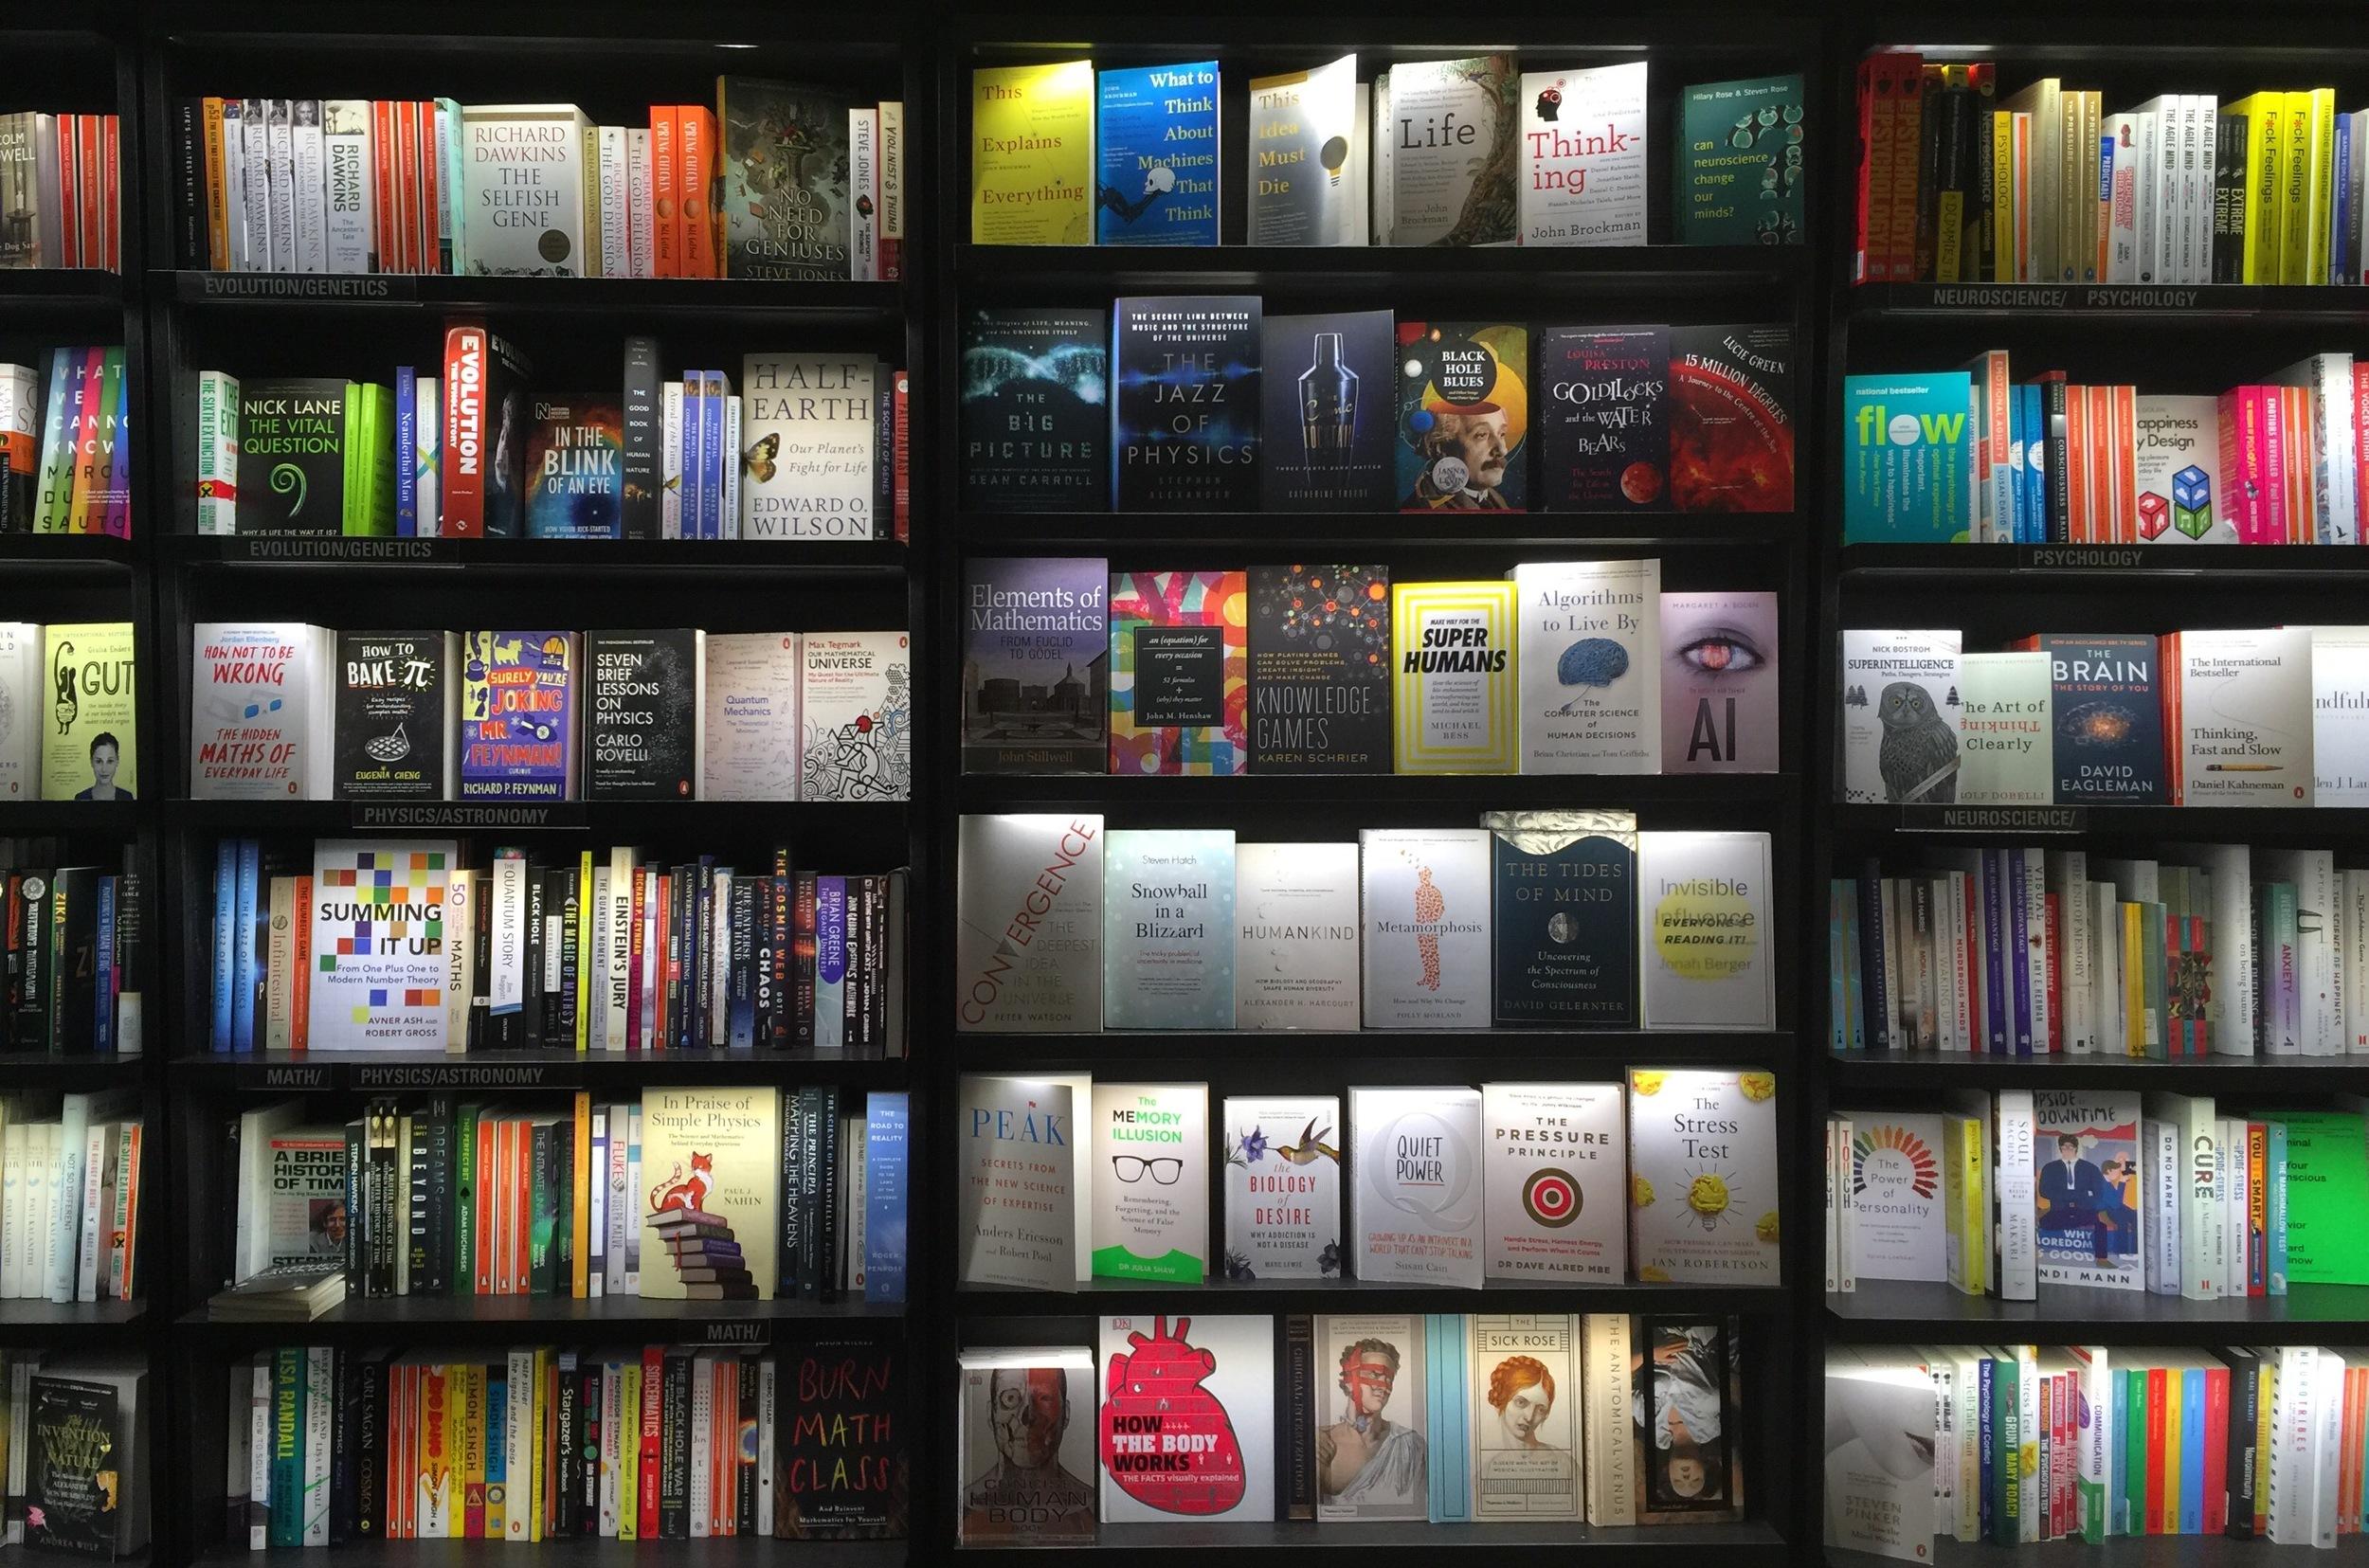 Popular Science at Dussmann bookshop